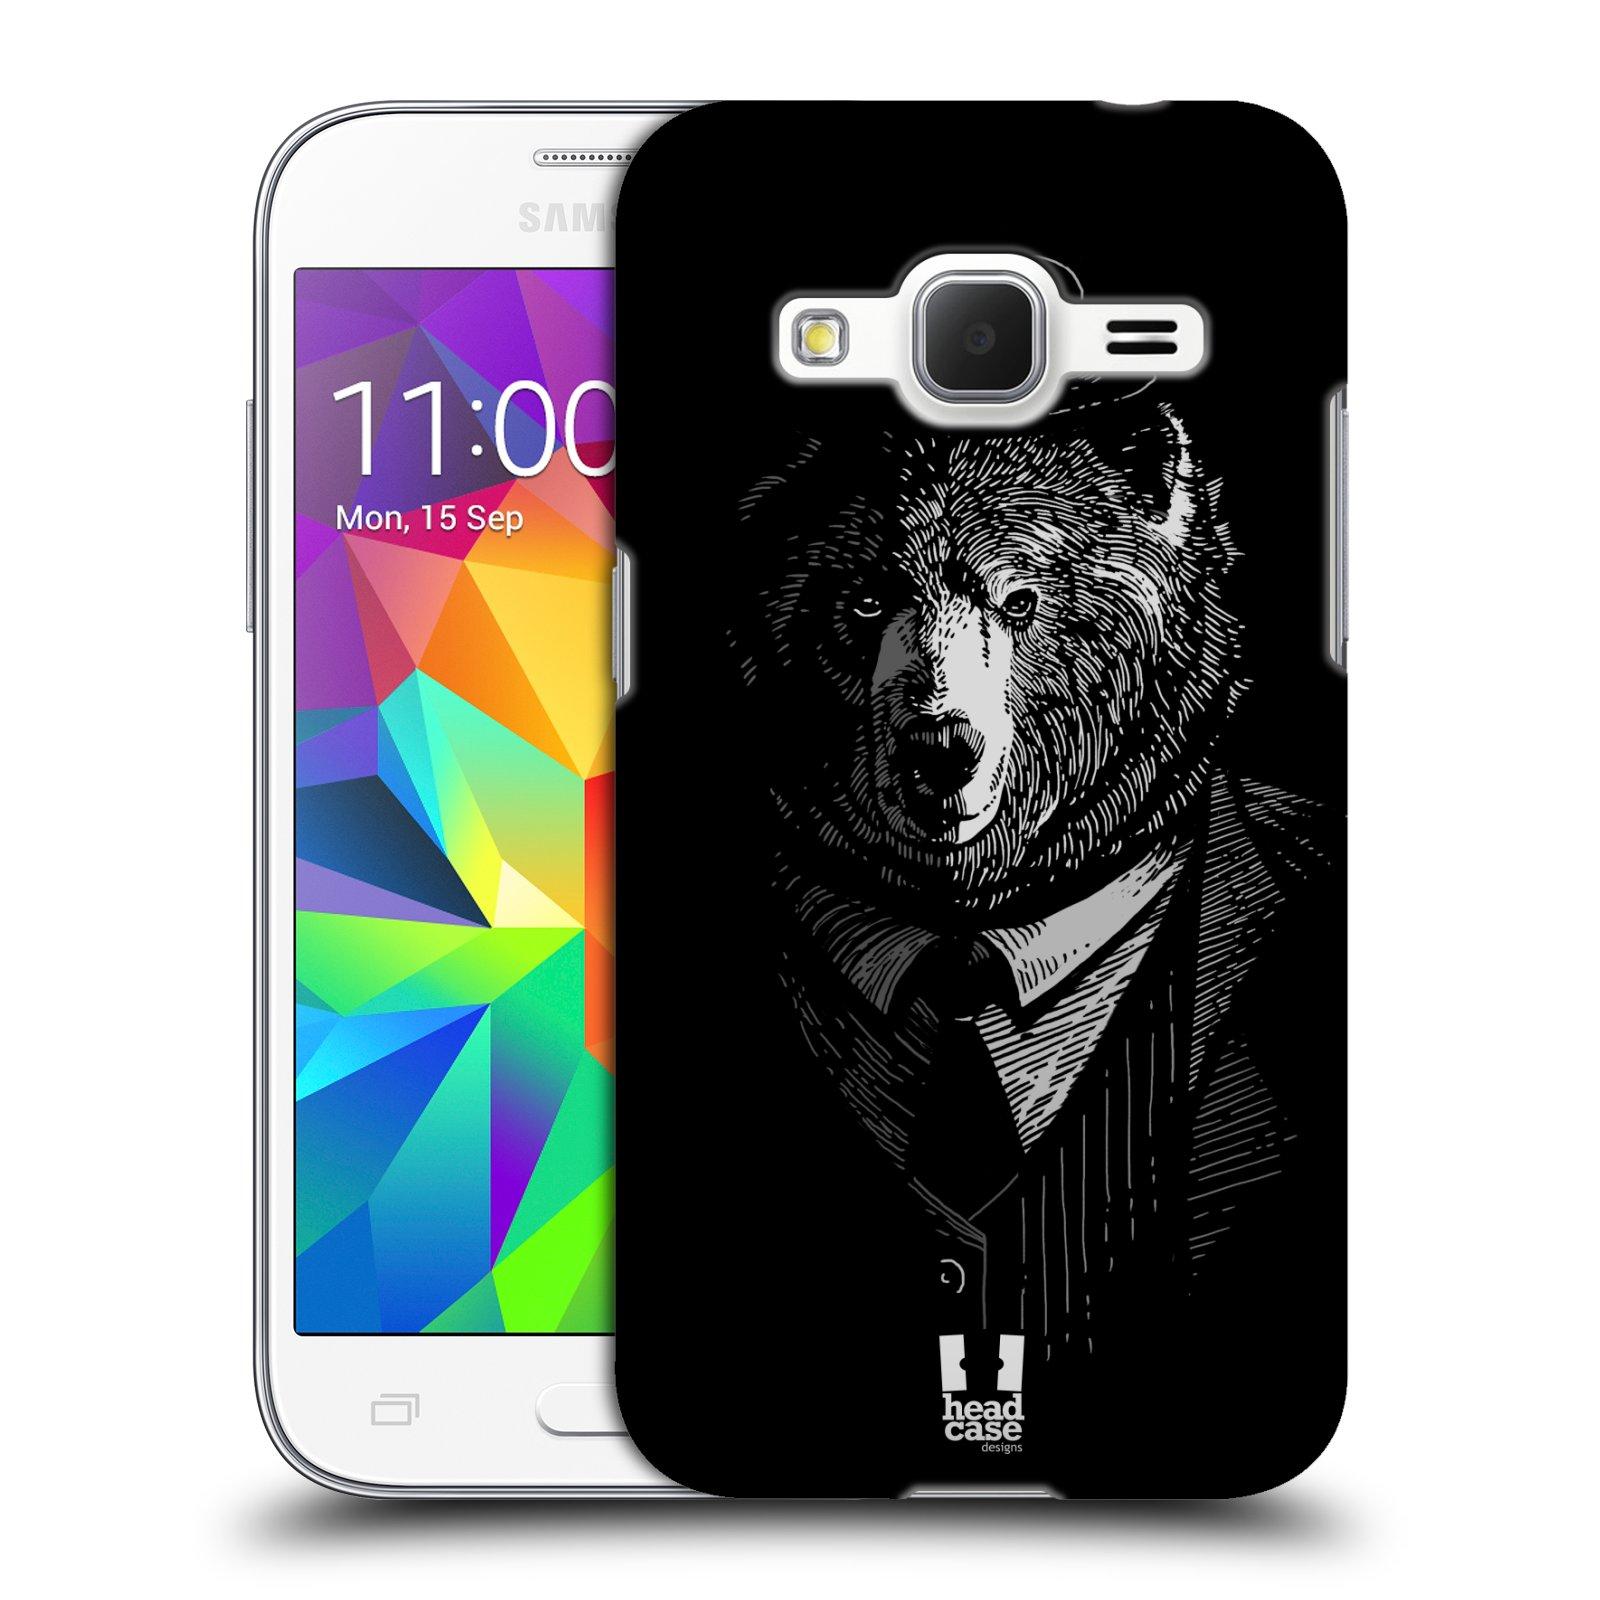 HEAD CASE plastový obal na mobil SAMSUNG GALAXY Core Prime (Core Prime VE) vzor Zvíře v obleku medvěd